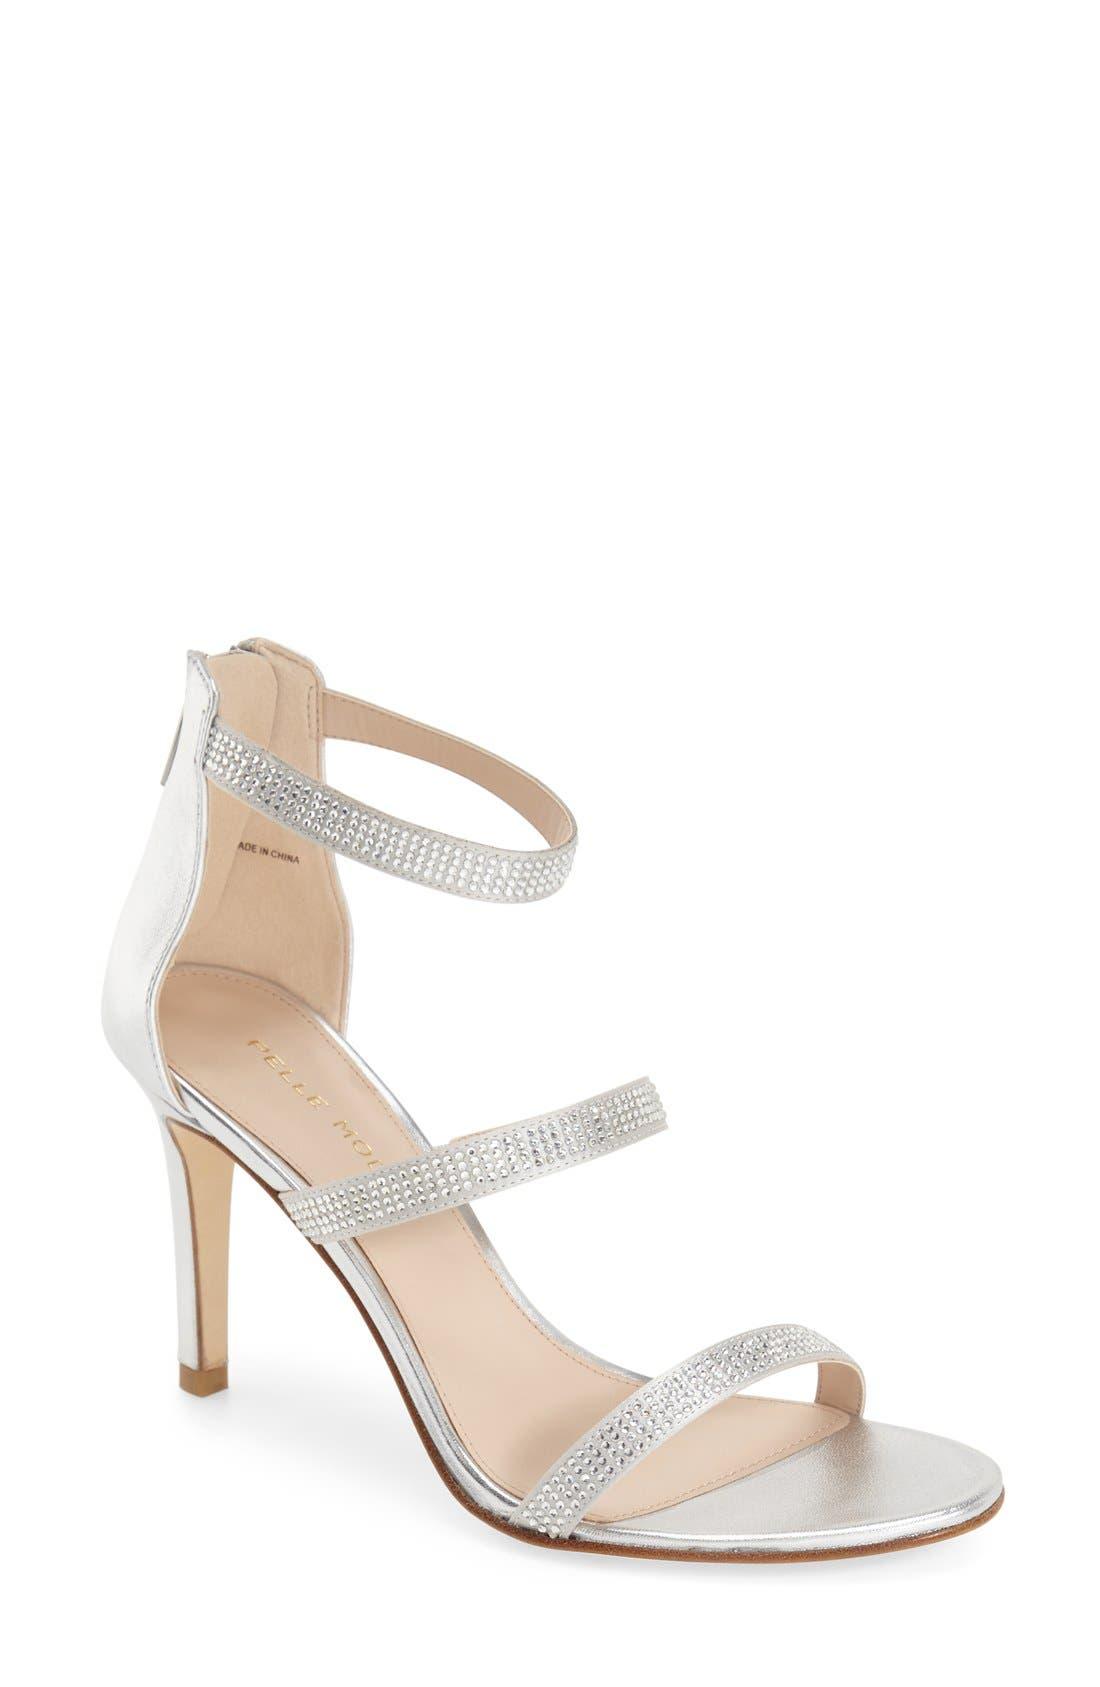 PELLE MODA 'Dalia' Three Strap Sandal